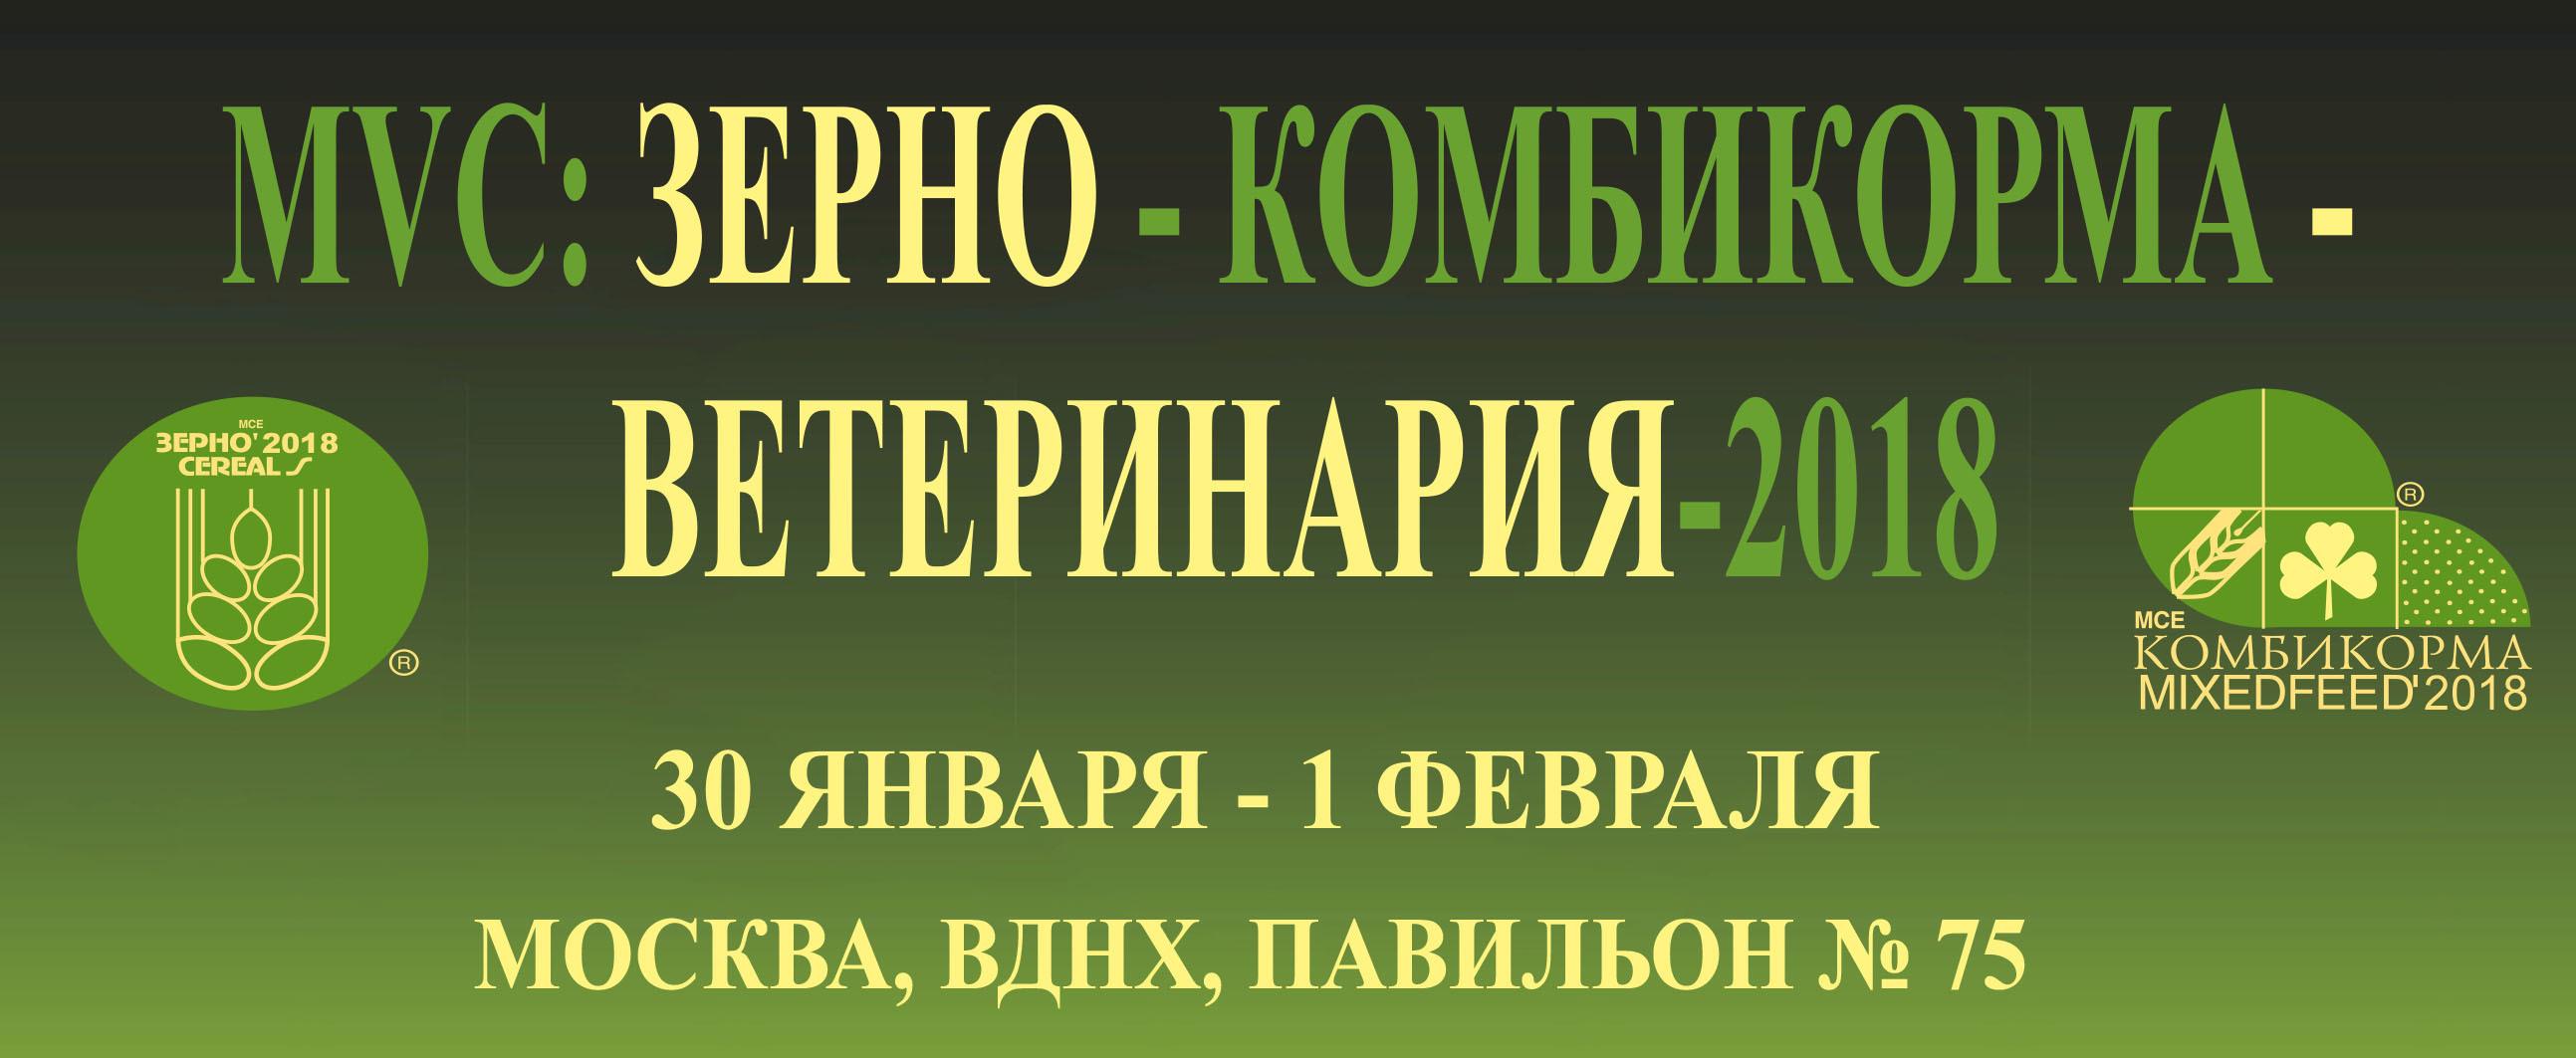 Выставка «MVC: зерно — комбикорма — ветеринария» с 30 января по 1 февраля на ВДНХ